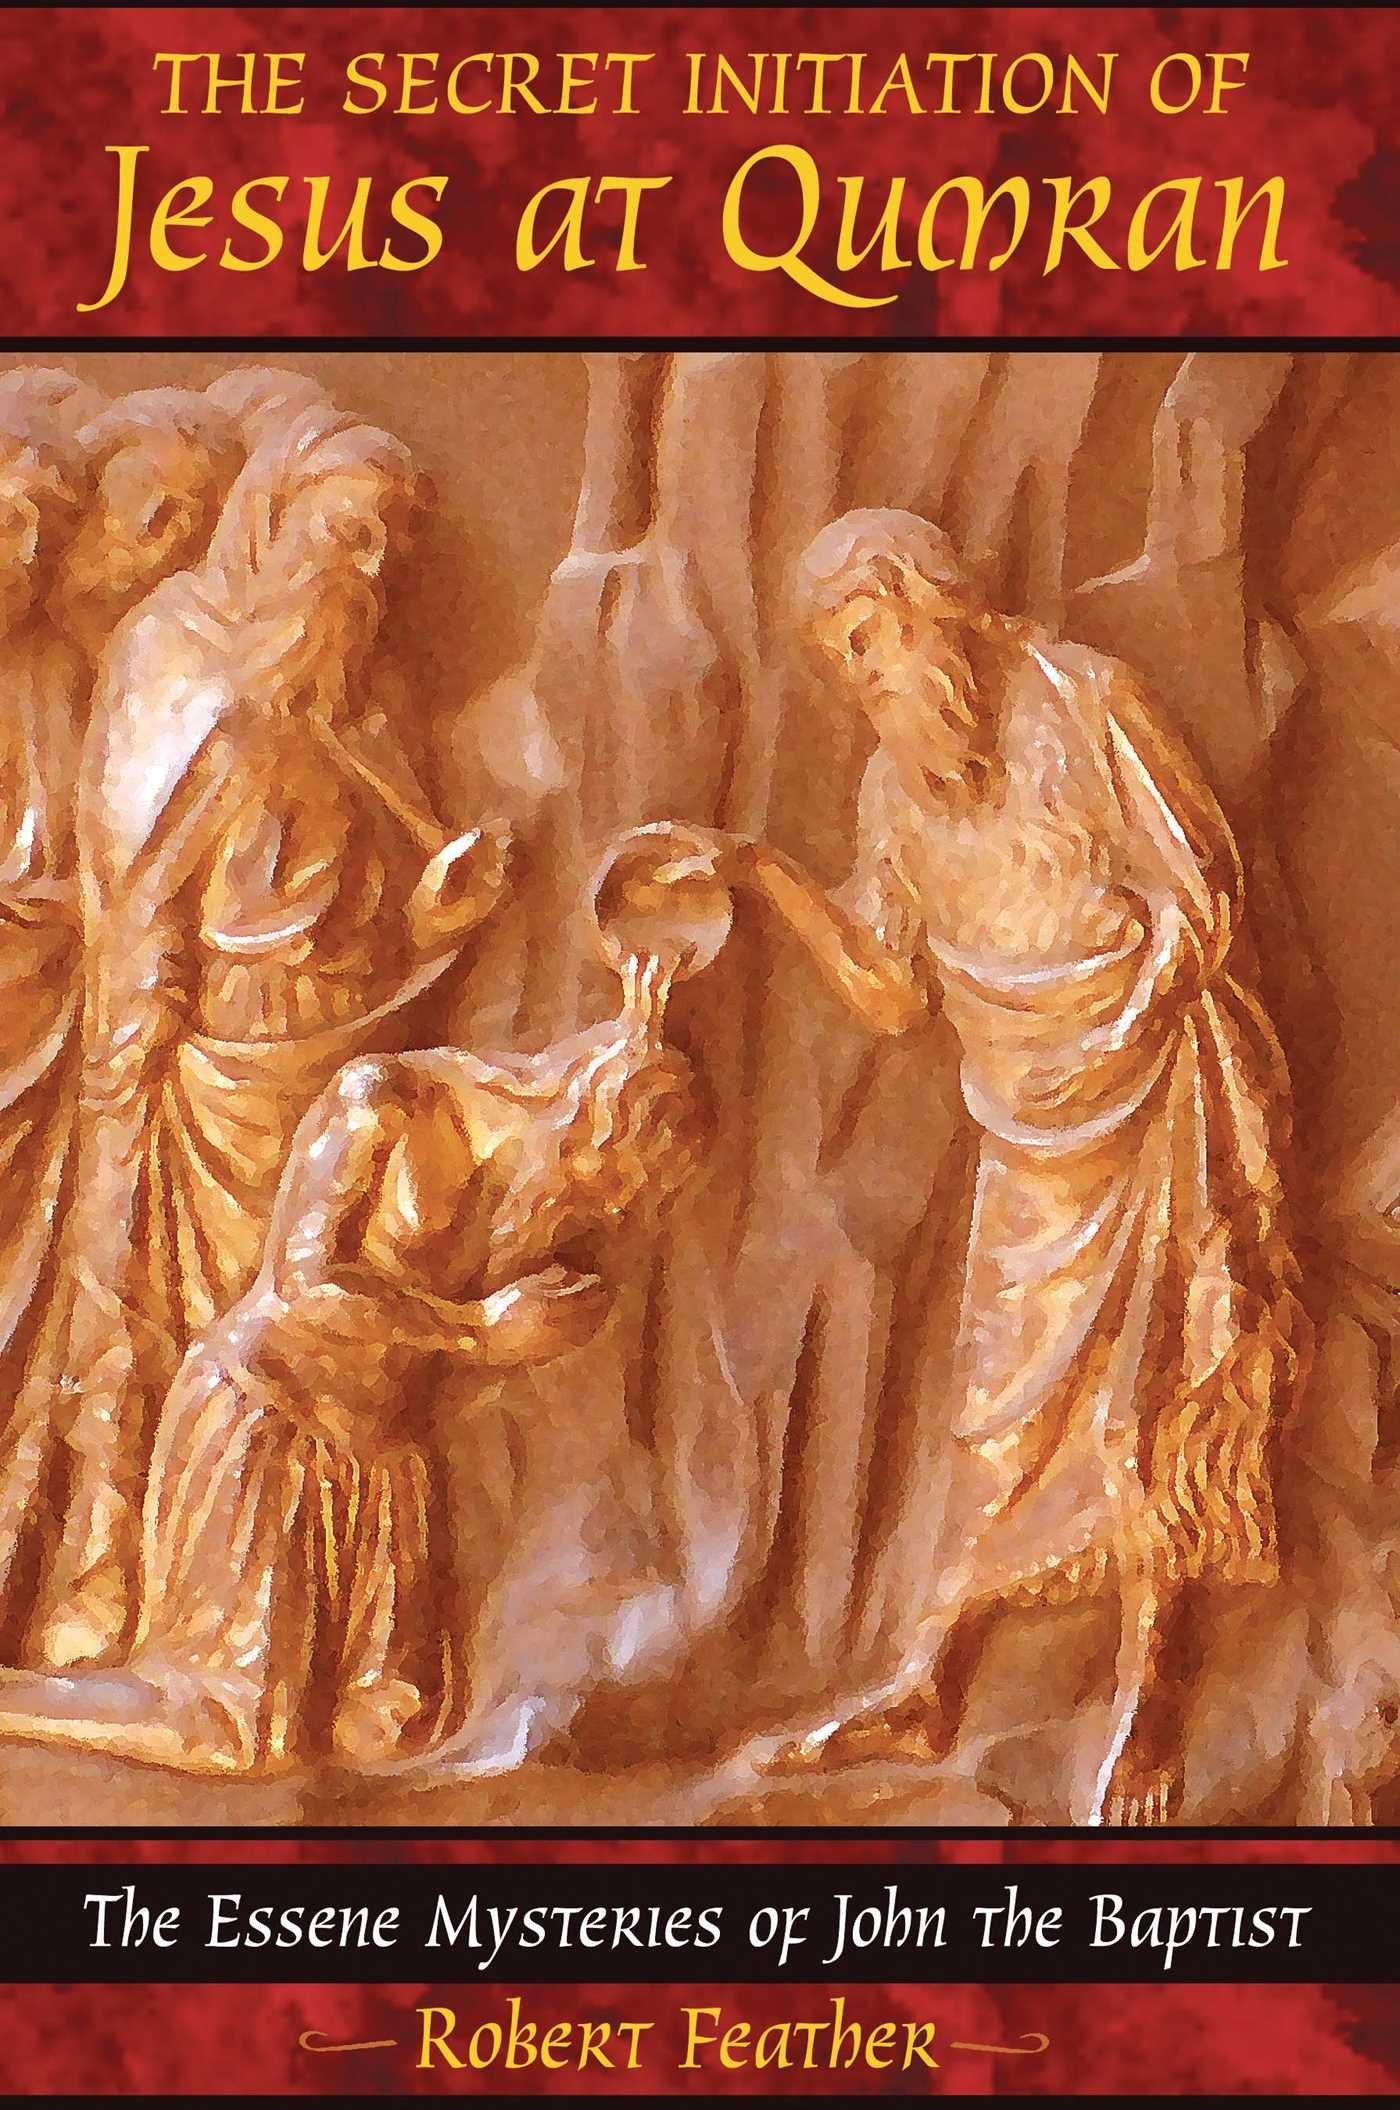 The Secret Initiation of Jesus at Qumran: The